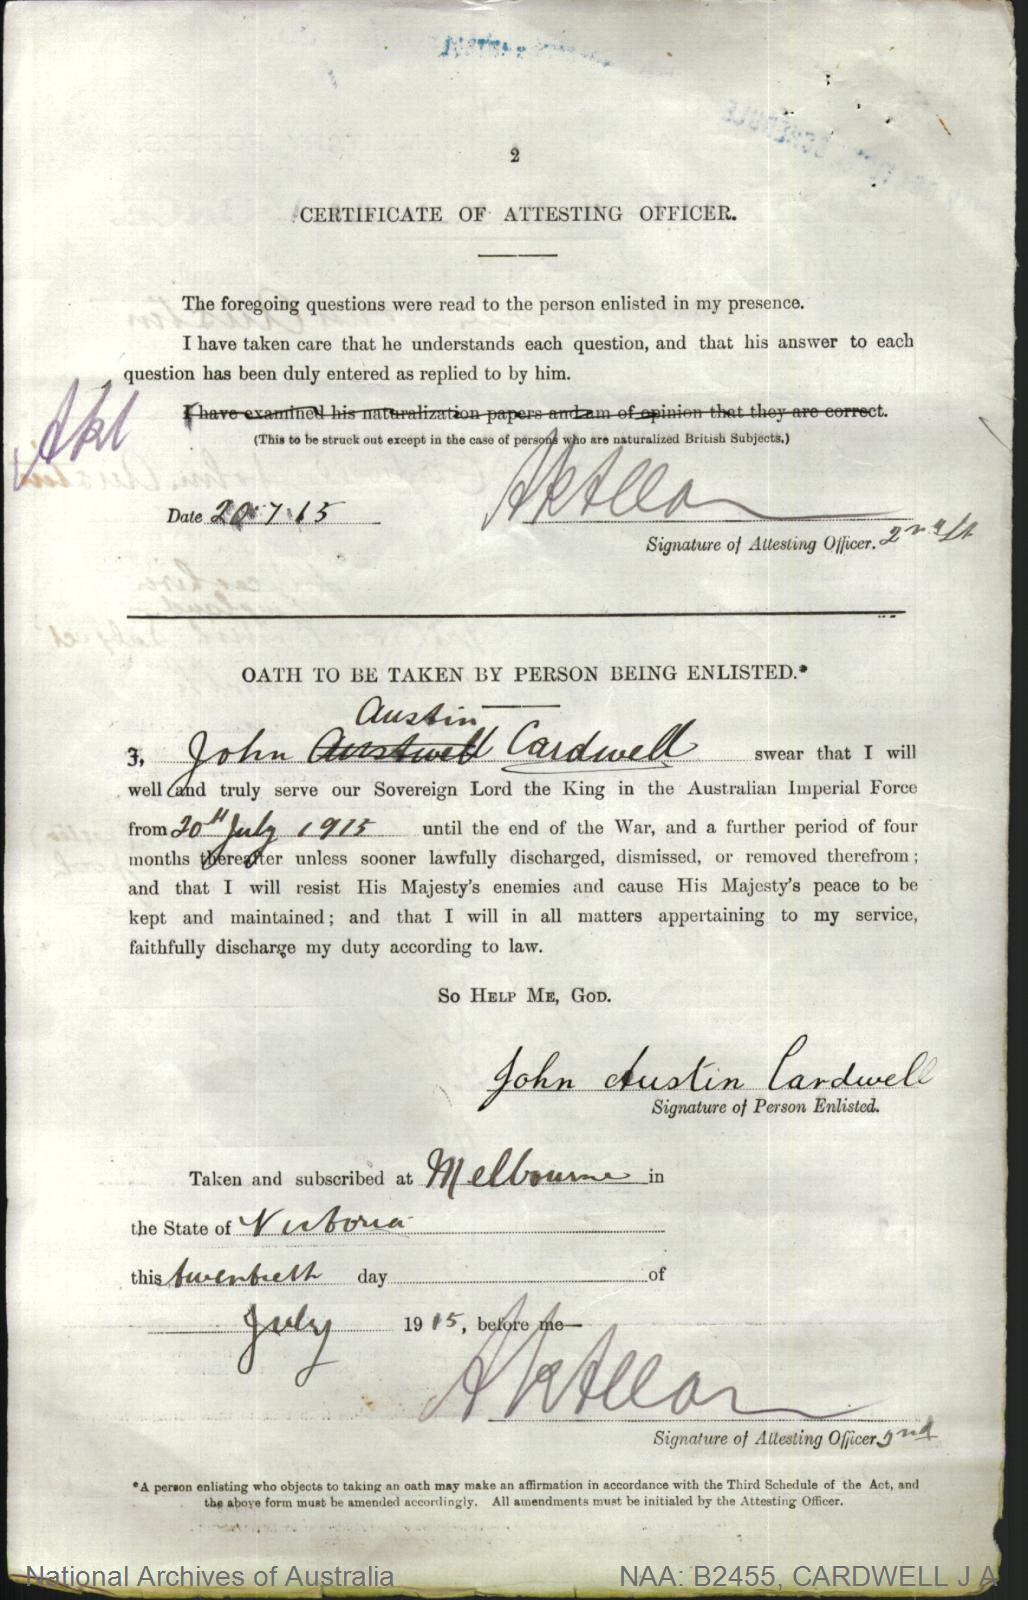 Cardwell John Austin : SERN DEPOT : POB Wigan England : POE Melbourne VIC : NOK S Cardwell Winefred Freda